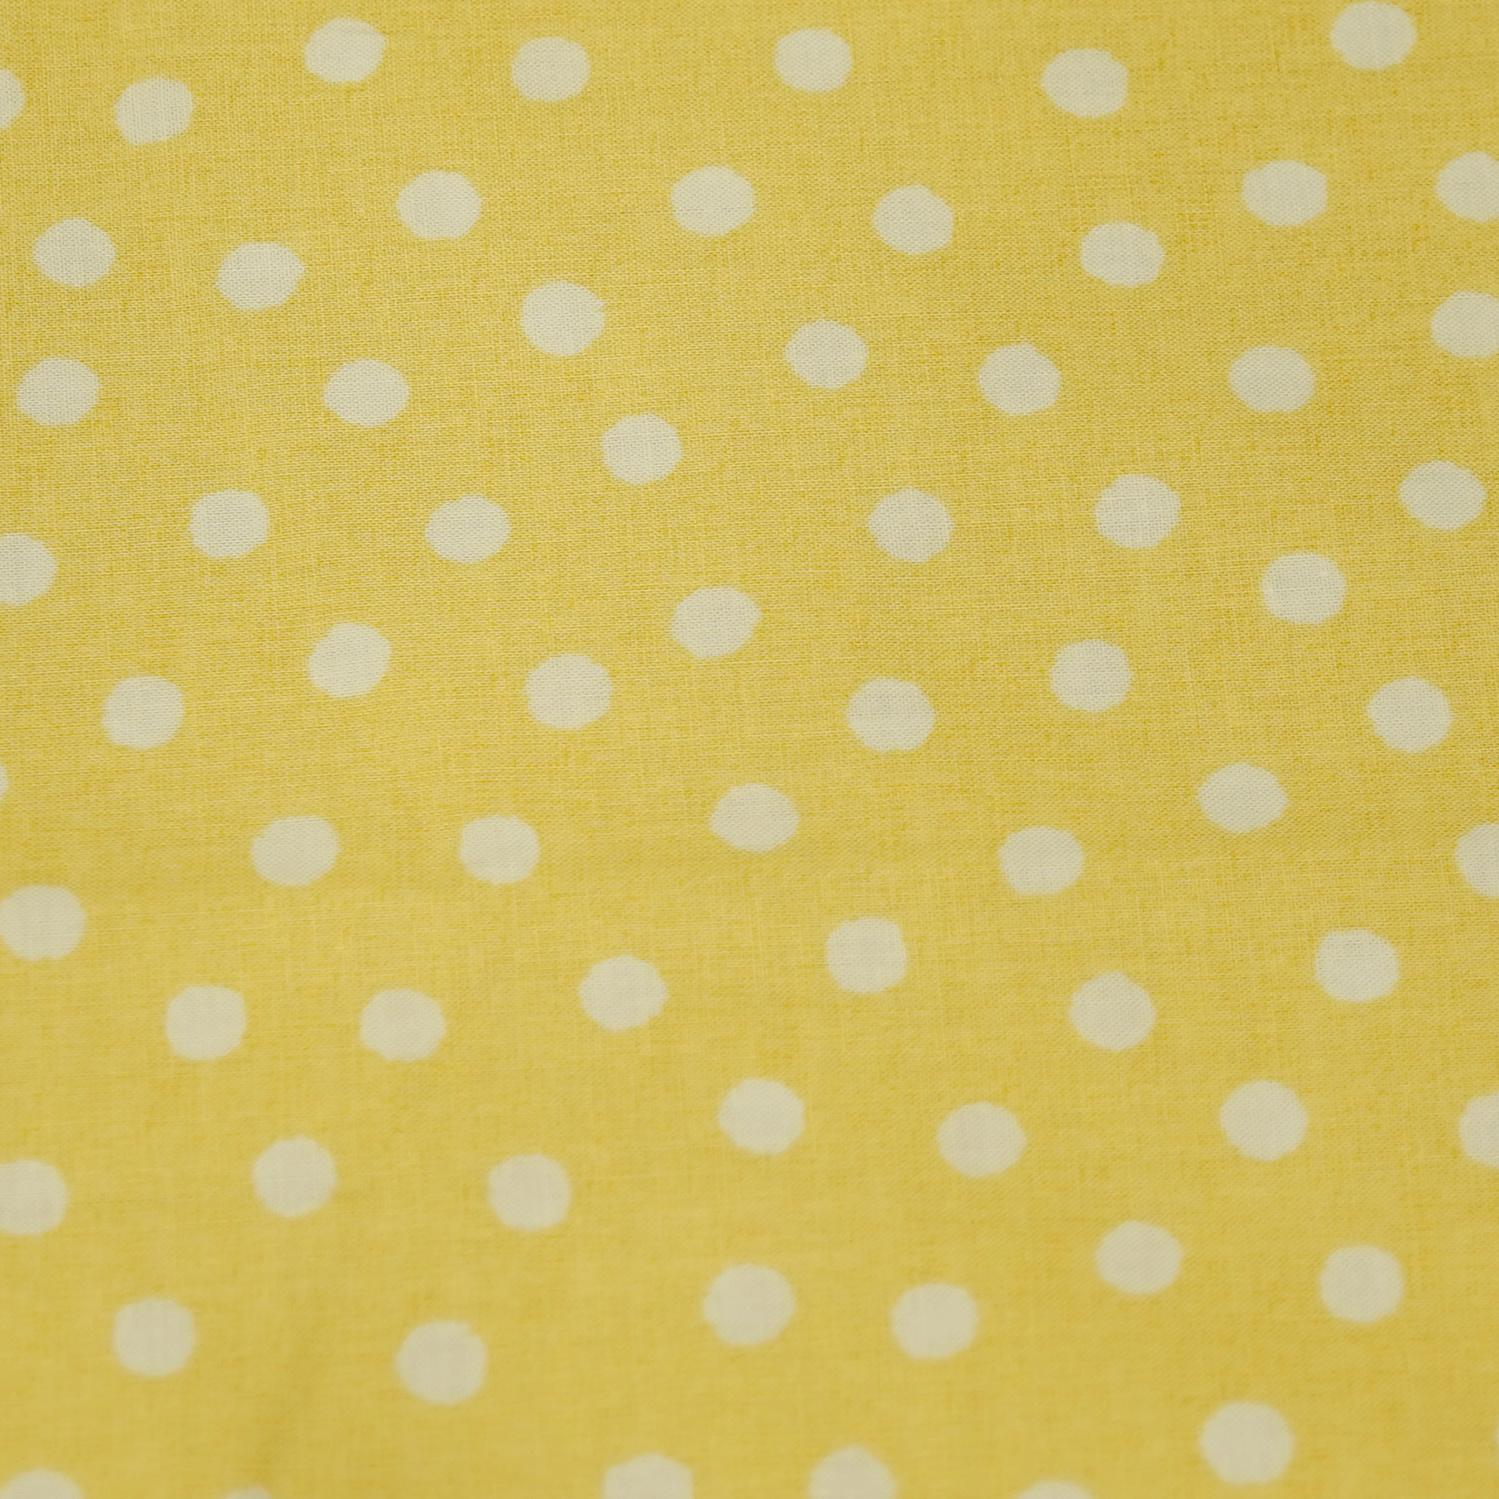 Handworks - Mid Spot - Yellow